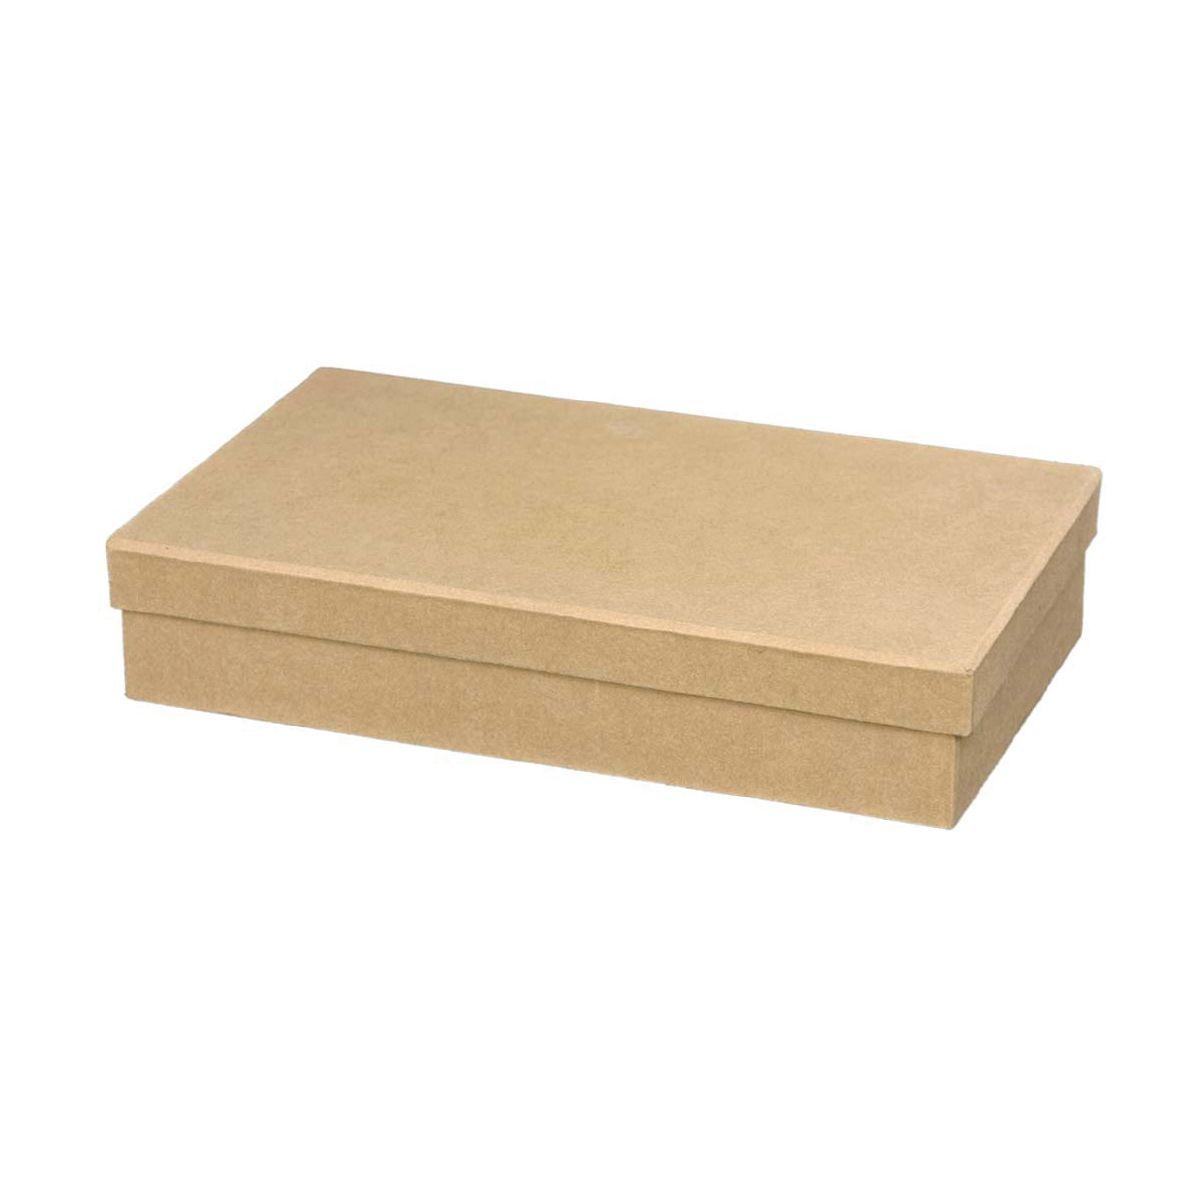 Scatole cartone colorate with scatole cartone colorate - Porta carta igienica leroy merlin ...